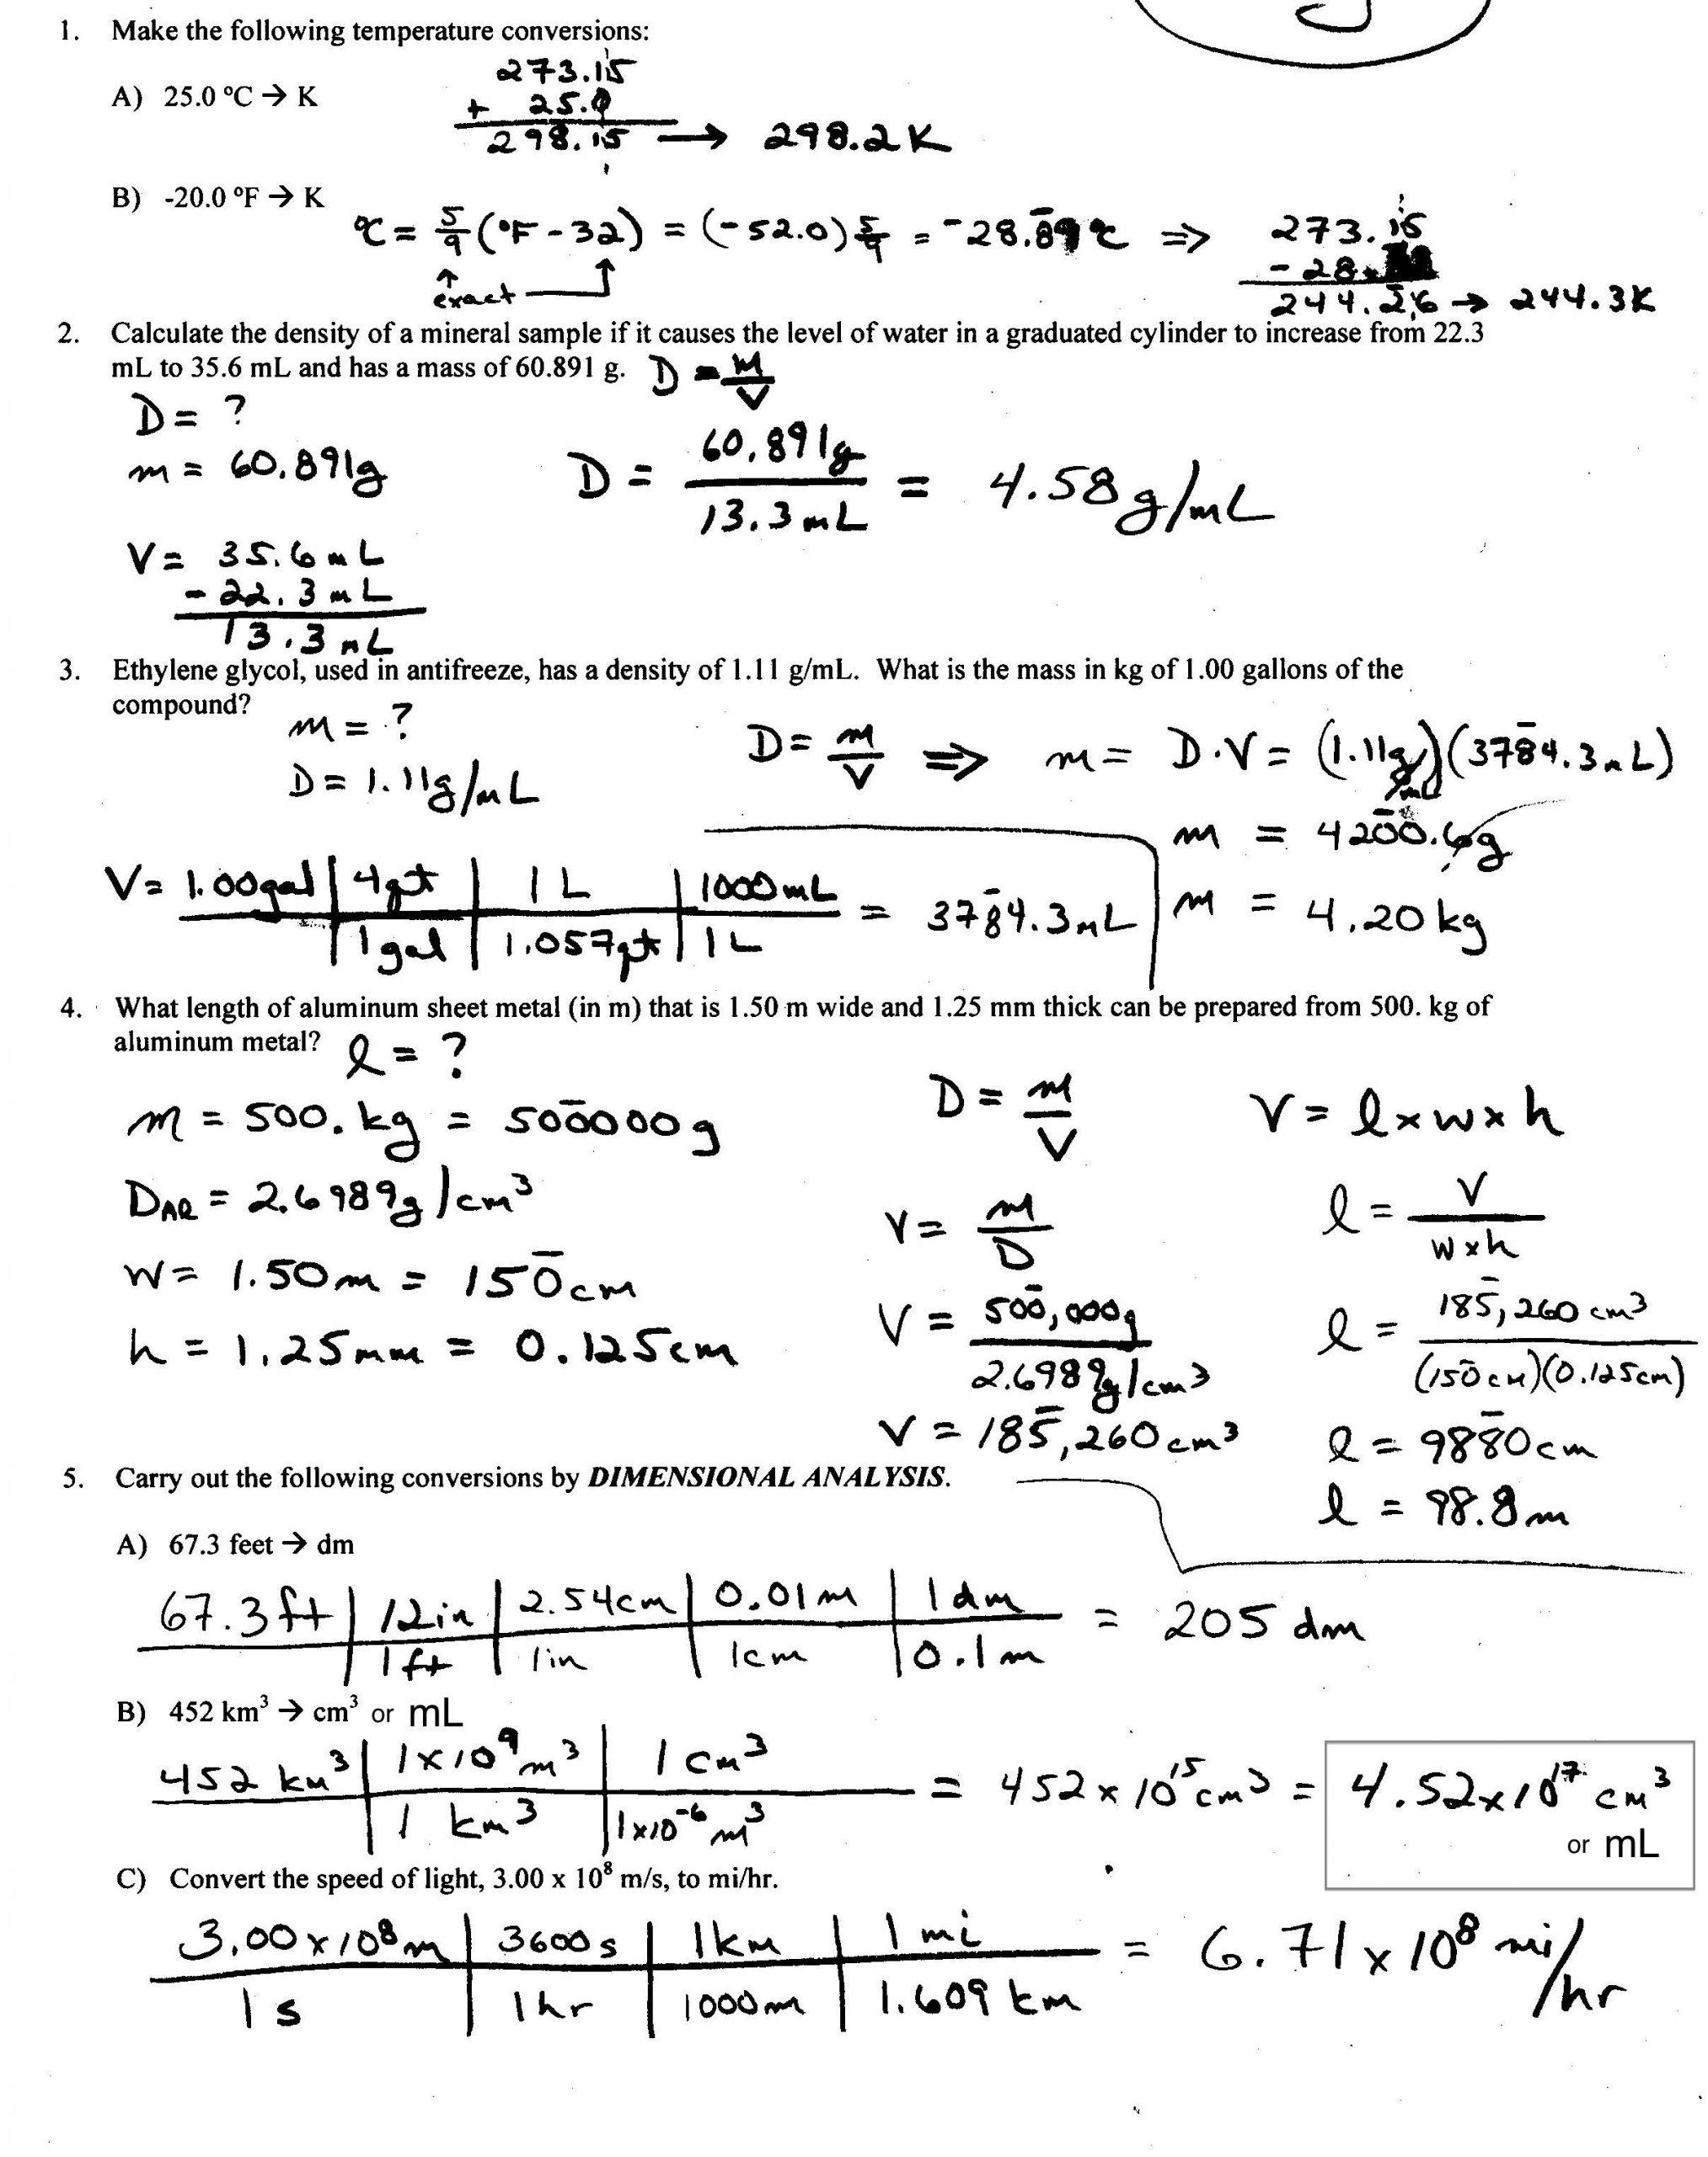 Density Worksheet Middle School Density Worksheet with Answers Calculate Density Worksheet